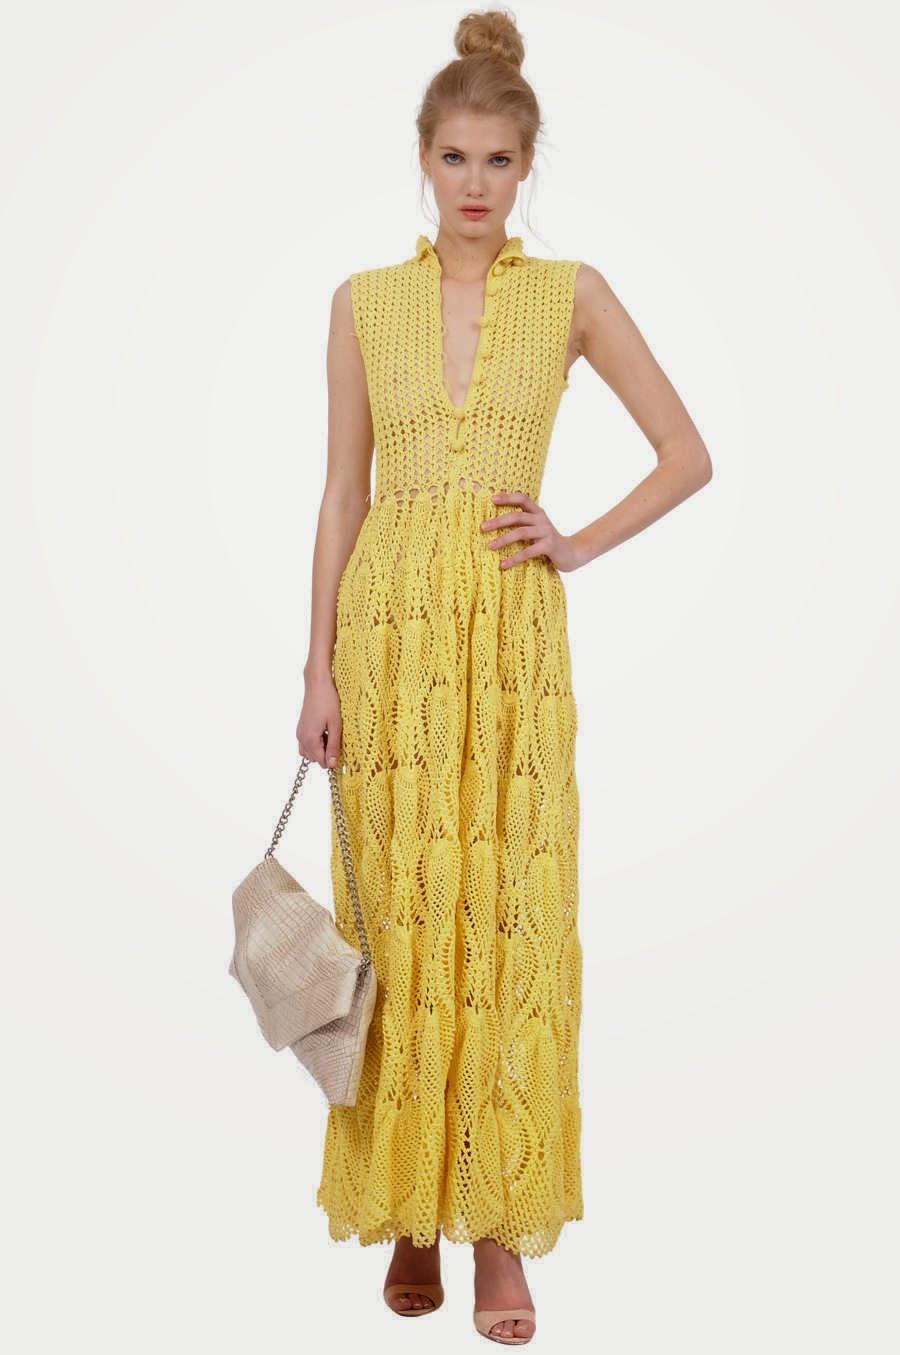 aa1578ed8 crochelinhasagulhas: Vestido amarelo de crochê